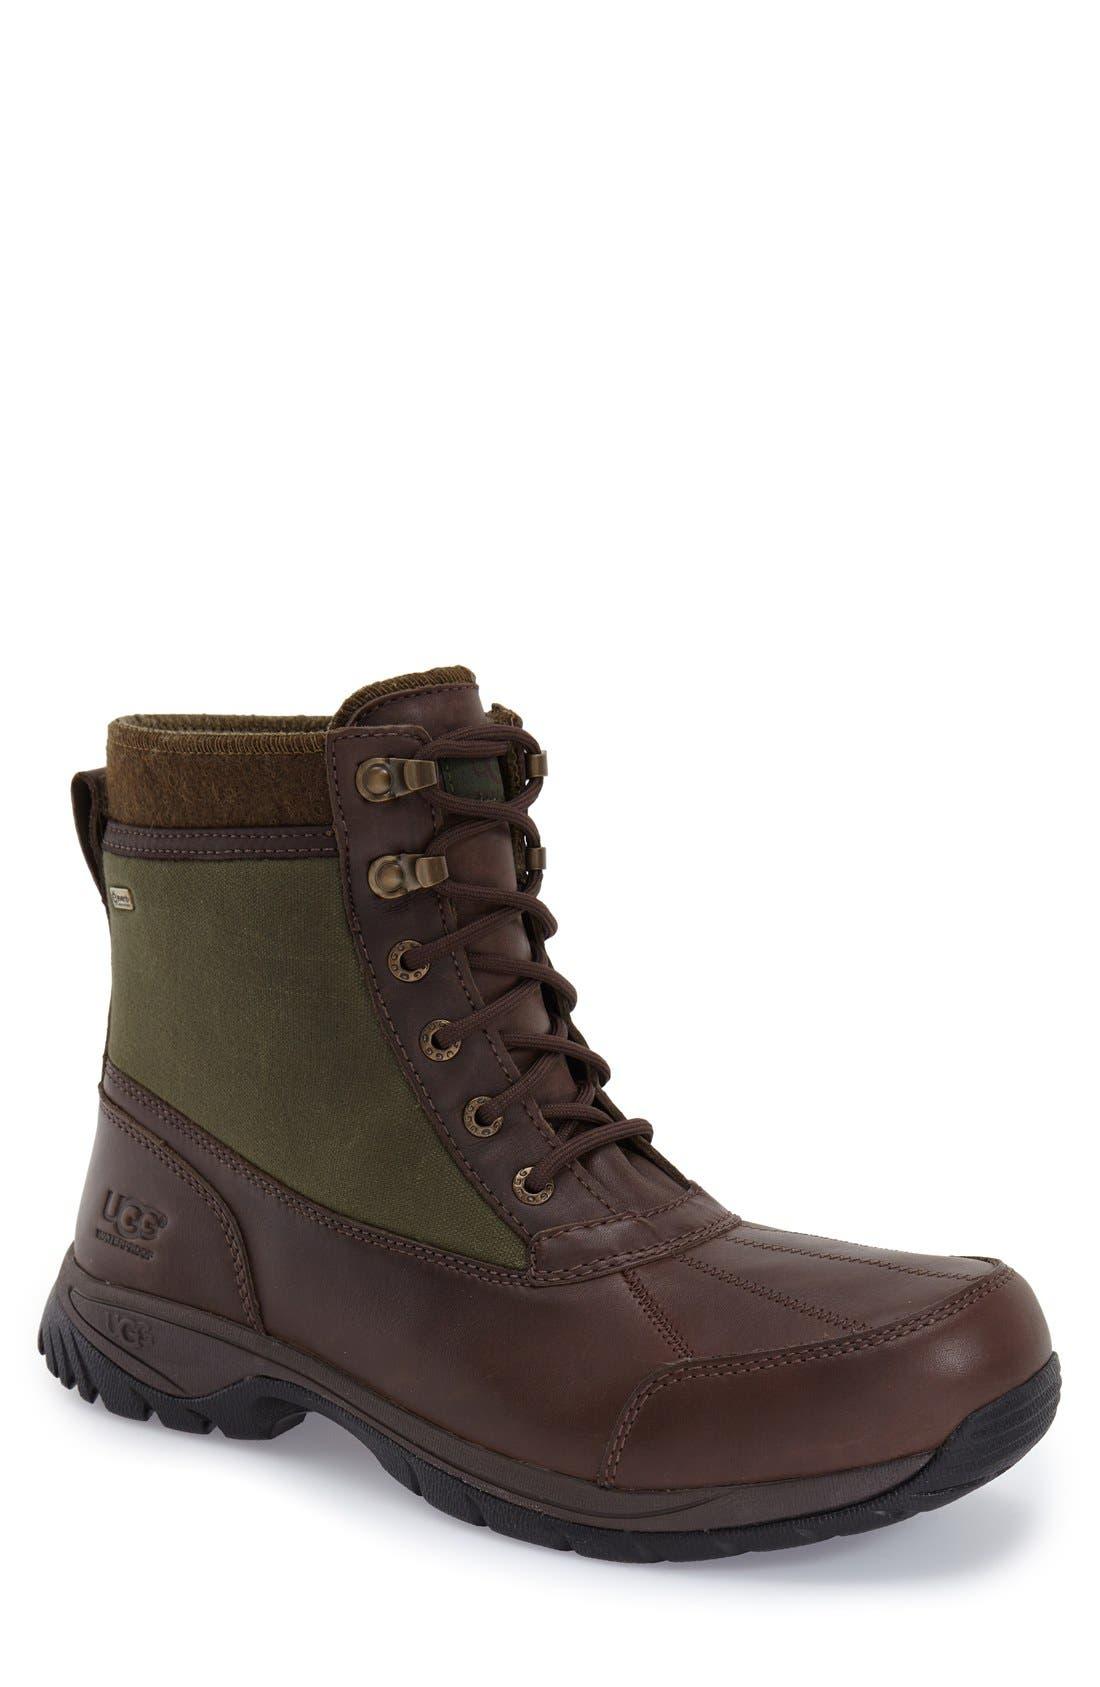 Alternate Image 1 Selected - UGG® 'Eaglin' Waterproof Snow Boot